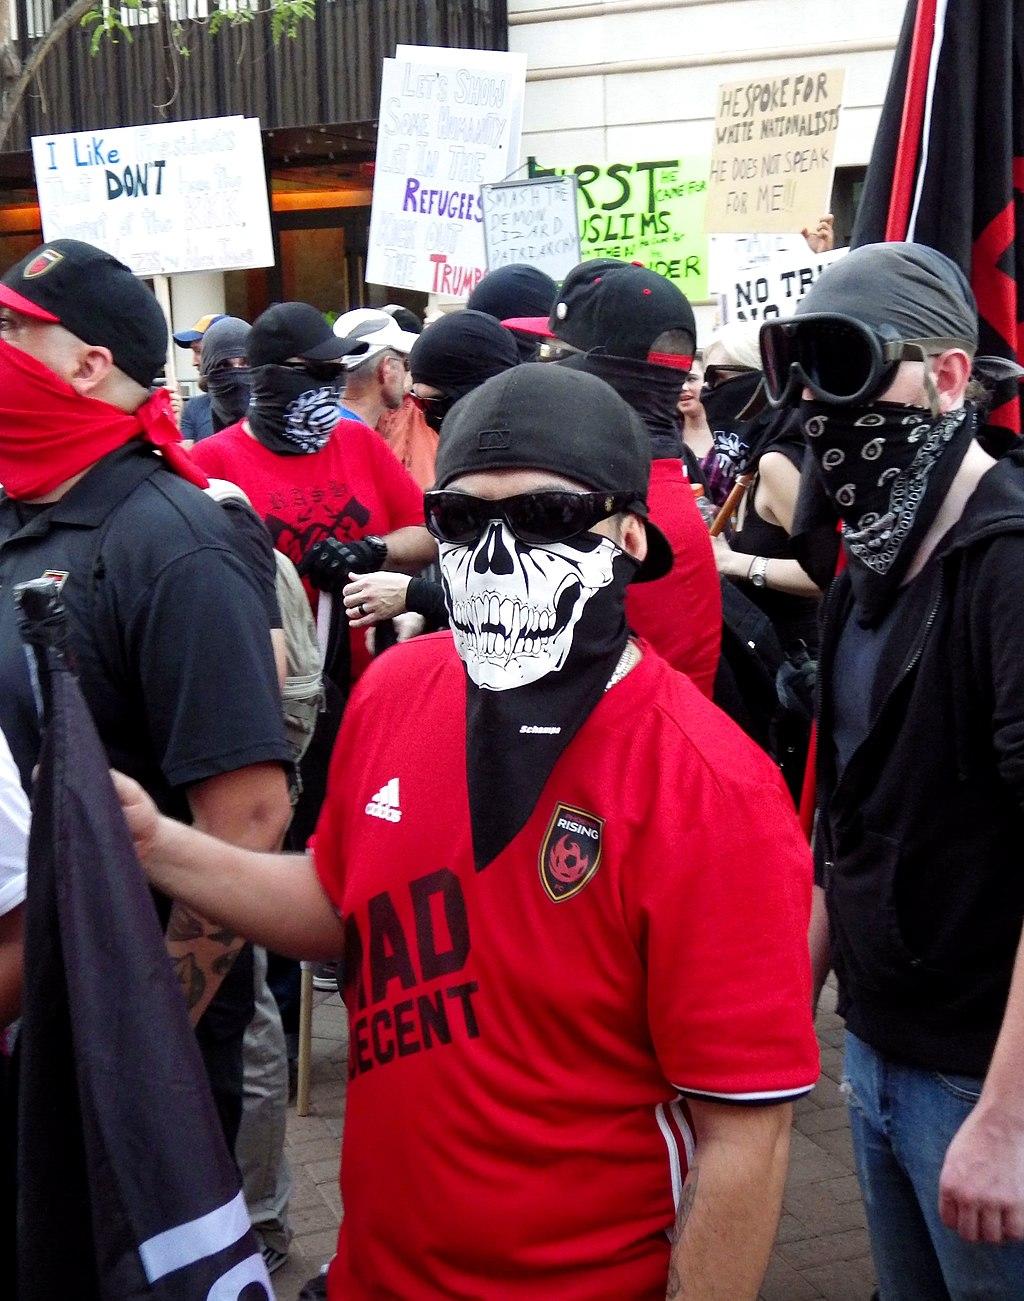 Donald Trump says USA will be designating Antifa as a terrorist organization